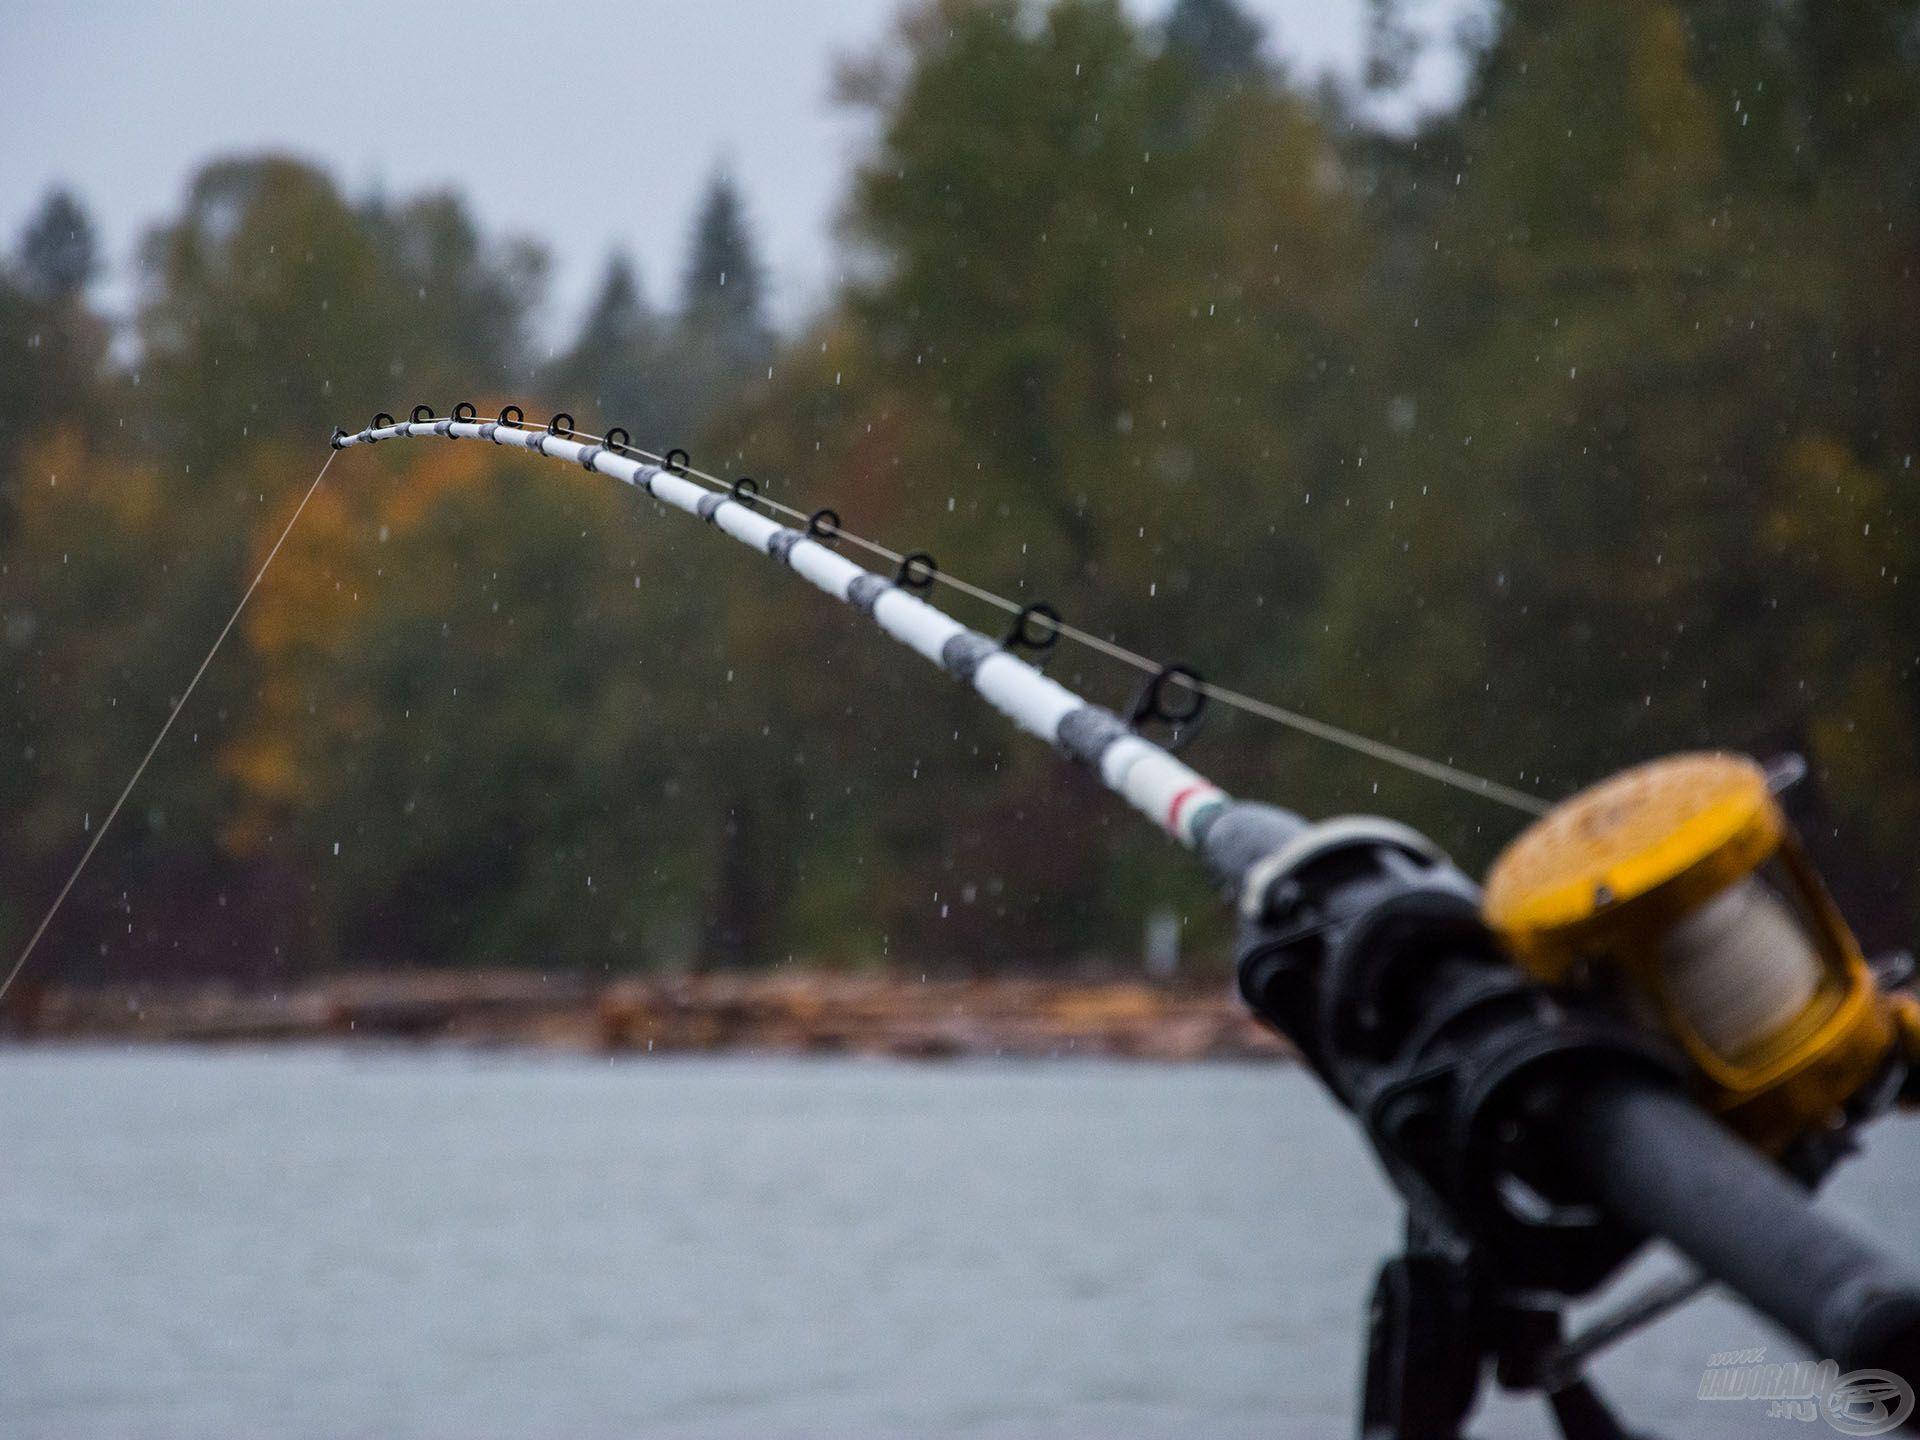 Eső… eső… eső -> no meg sok hal!